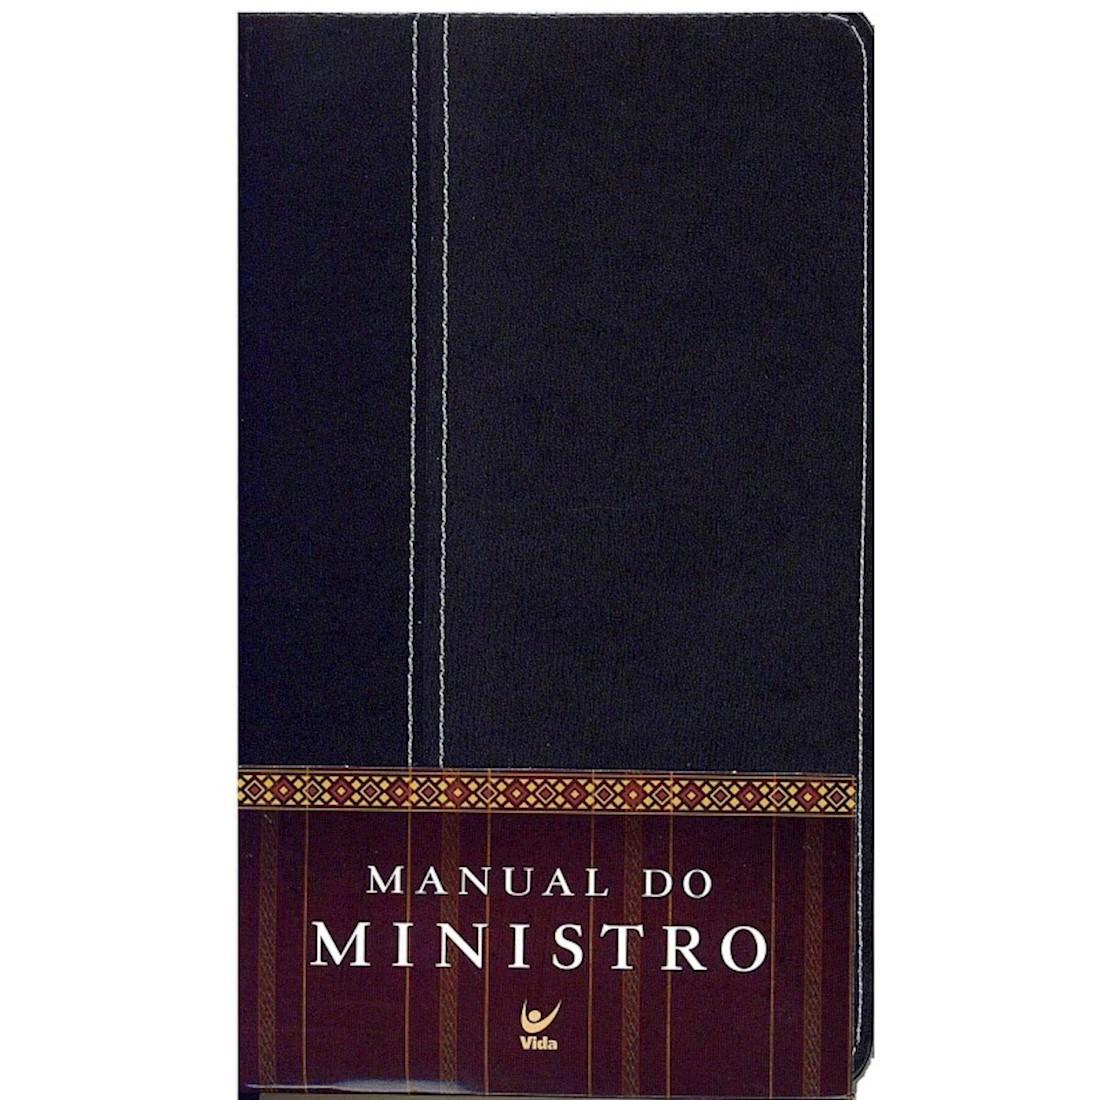 Livro Manual do Ministro - Capa Luxo